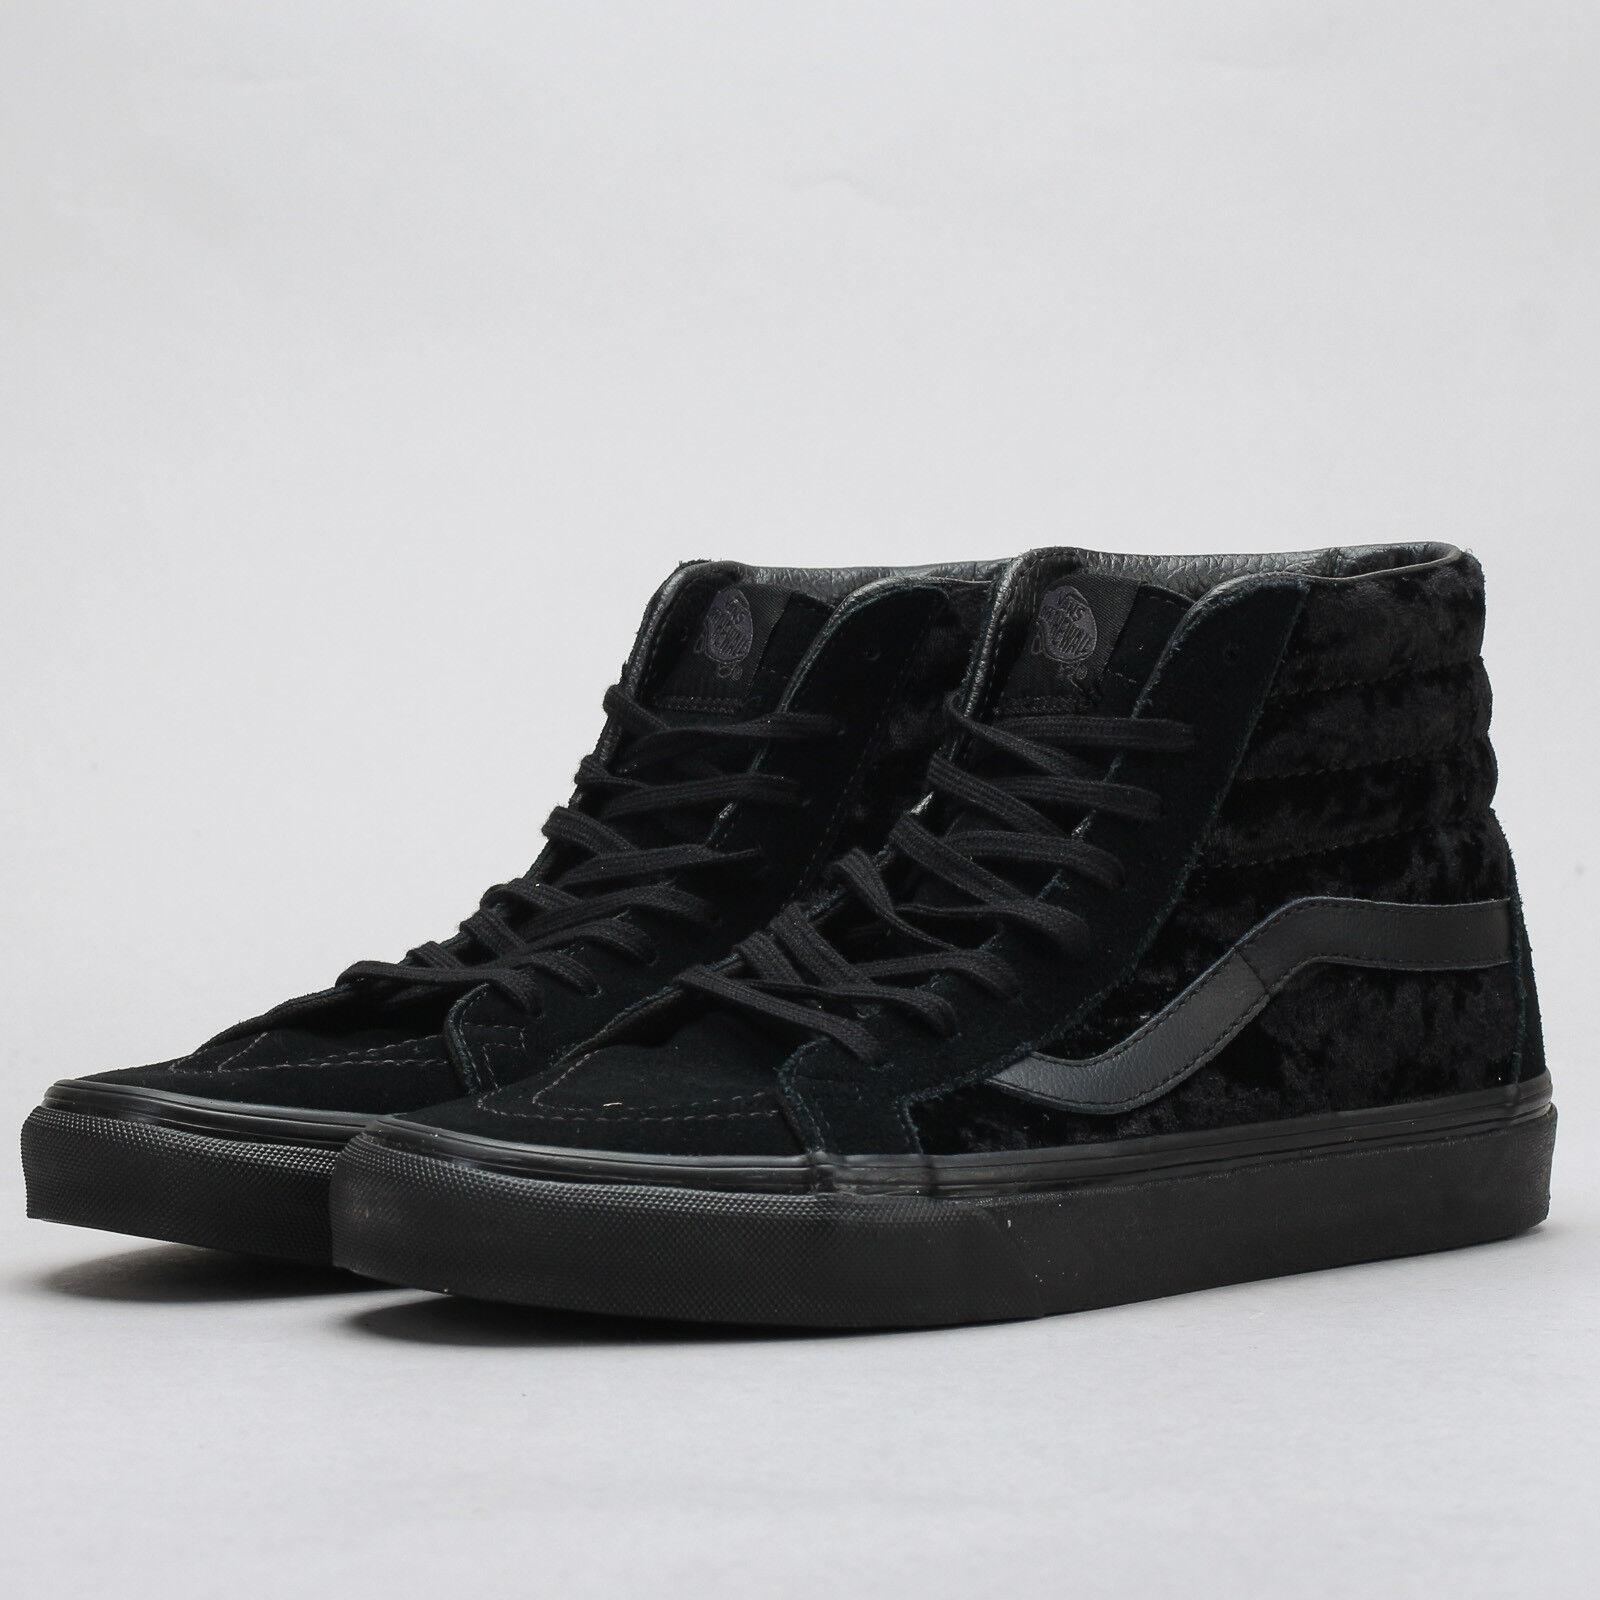 Vans SK8 - Hi Reissue (velvet) black / black EU 42, Frauen, Schwarz, VA2XSBNQ9